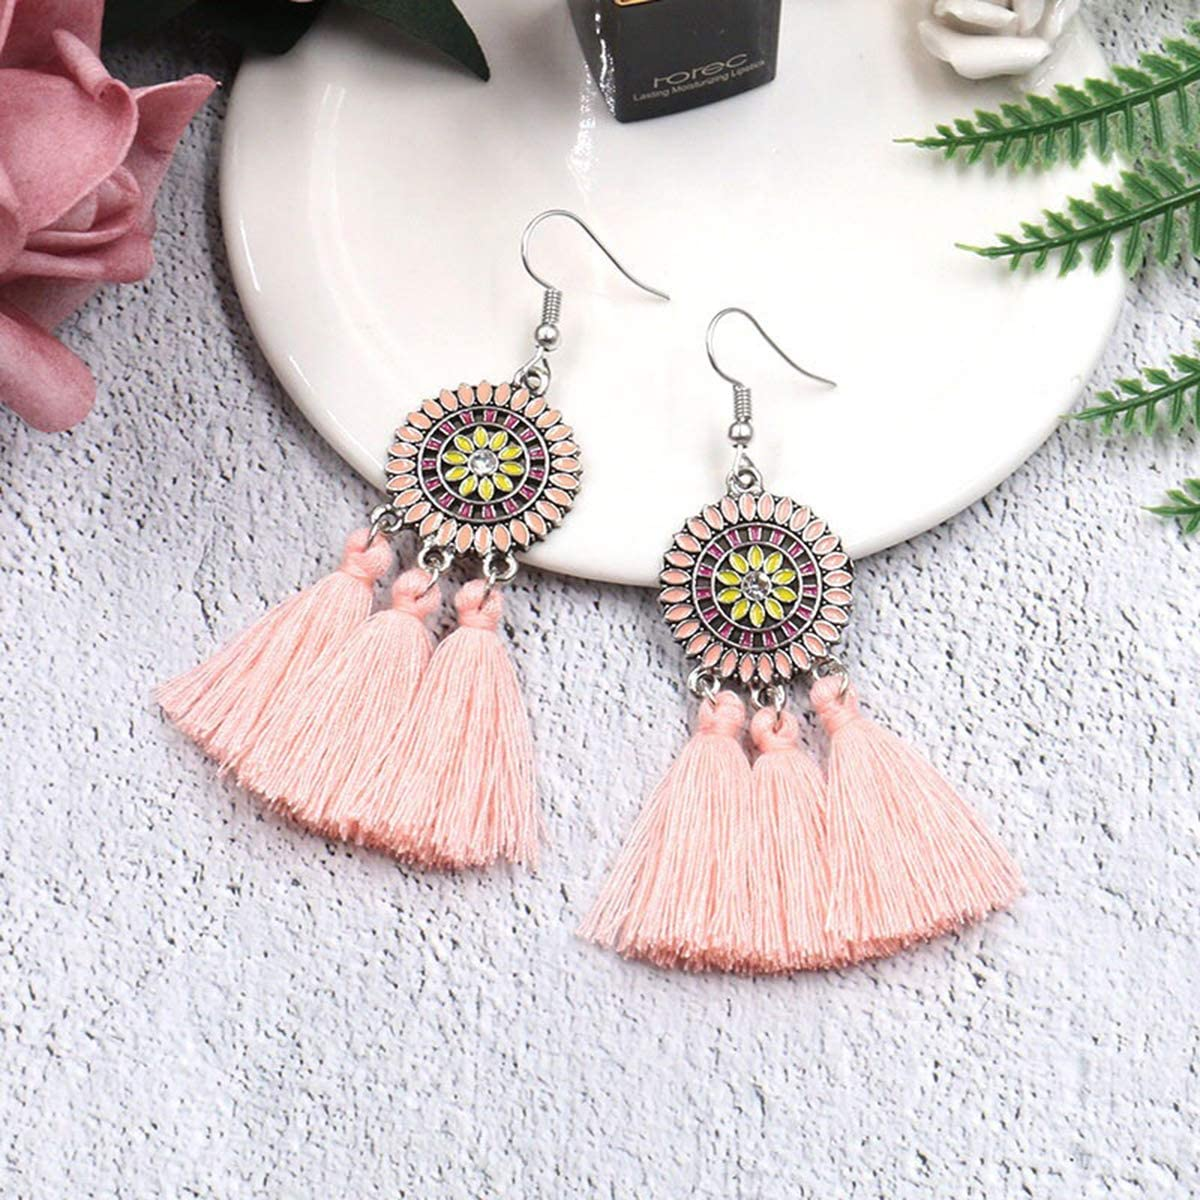 LANTAI 8-12 Pairs Bohemian Tassel Earrings-Colorful Hoop Fringe Layerd Dangling Tassel Earrings for Women Girls Gift Statement Earrings